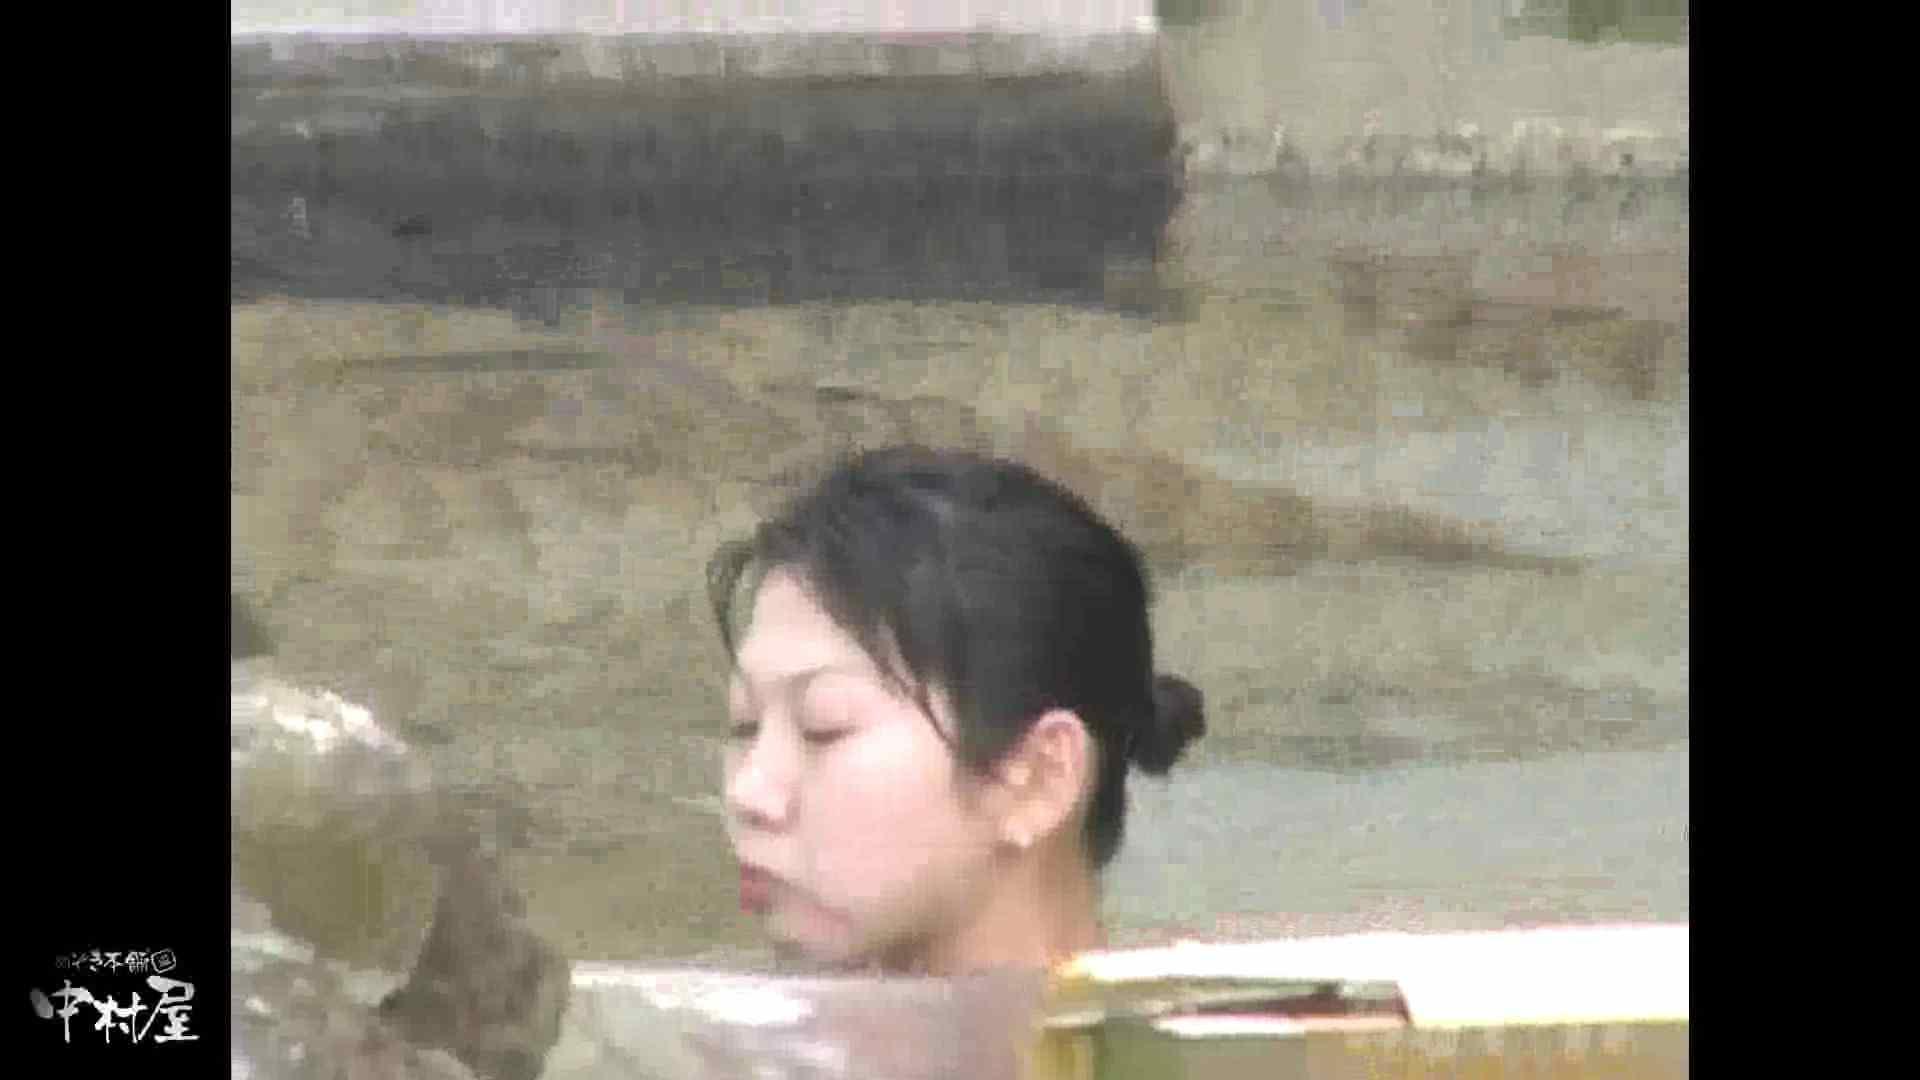 Aquaな露天風呂Vol.881潜入盗撮露天風呂十七判湯 其の三 潜入 のぞき動画画像 72画像 51